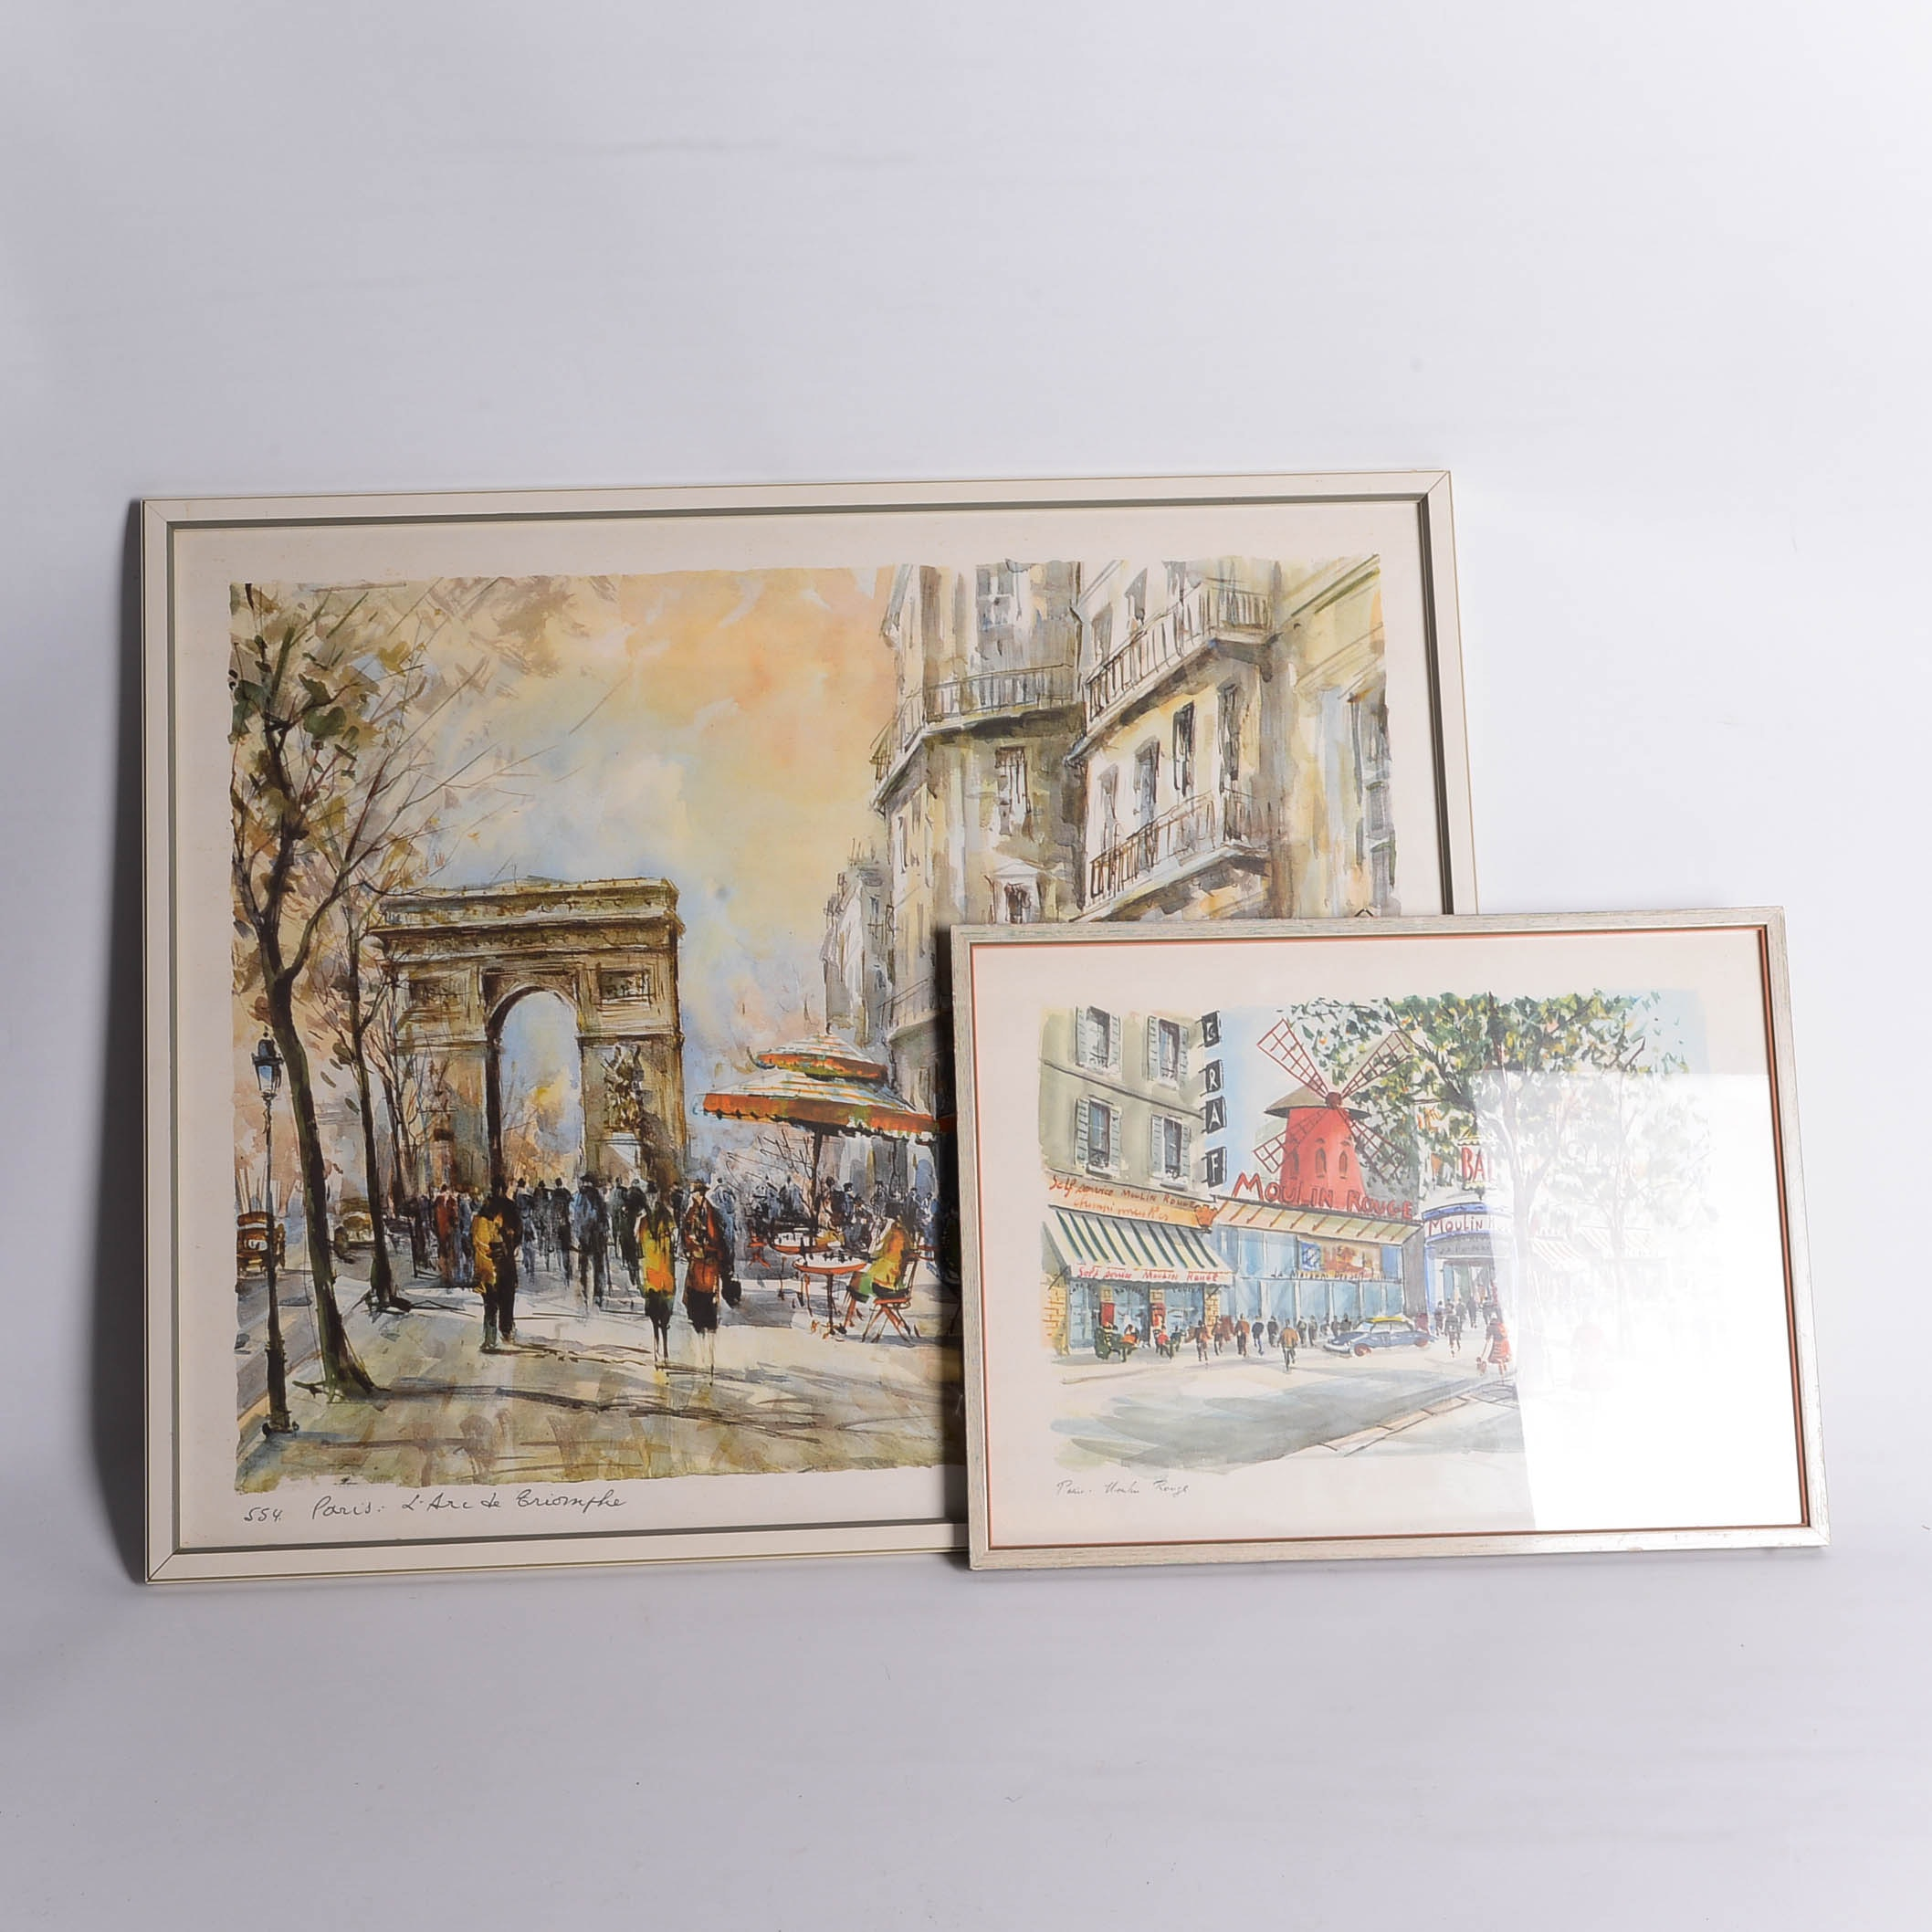 Vintage Offset Lithographs of Parisian City Streets